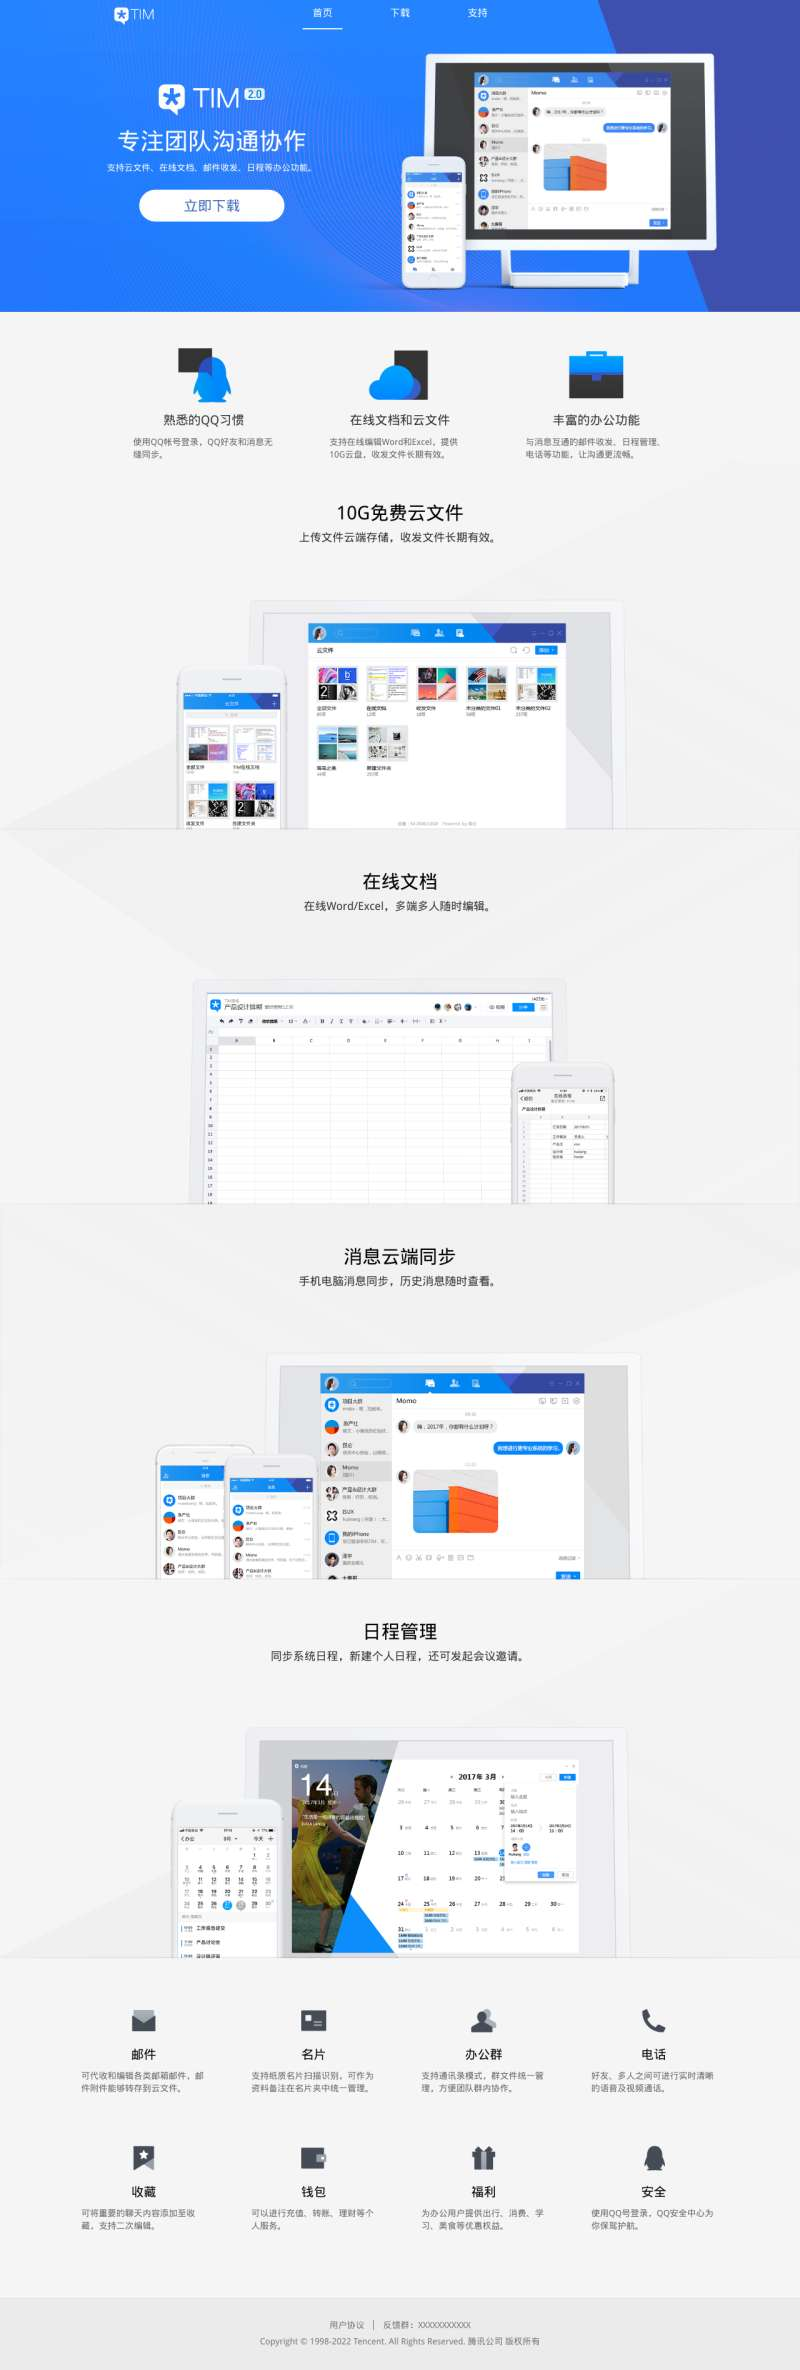 TIM产品官网介绍软件下载页面模板